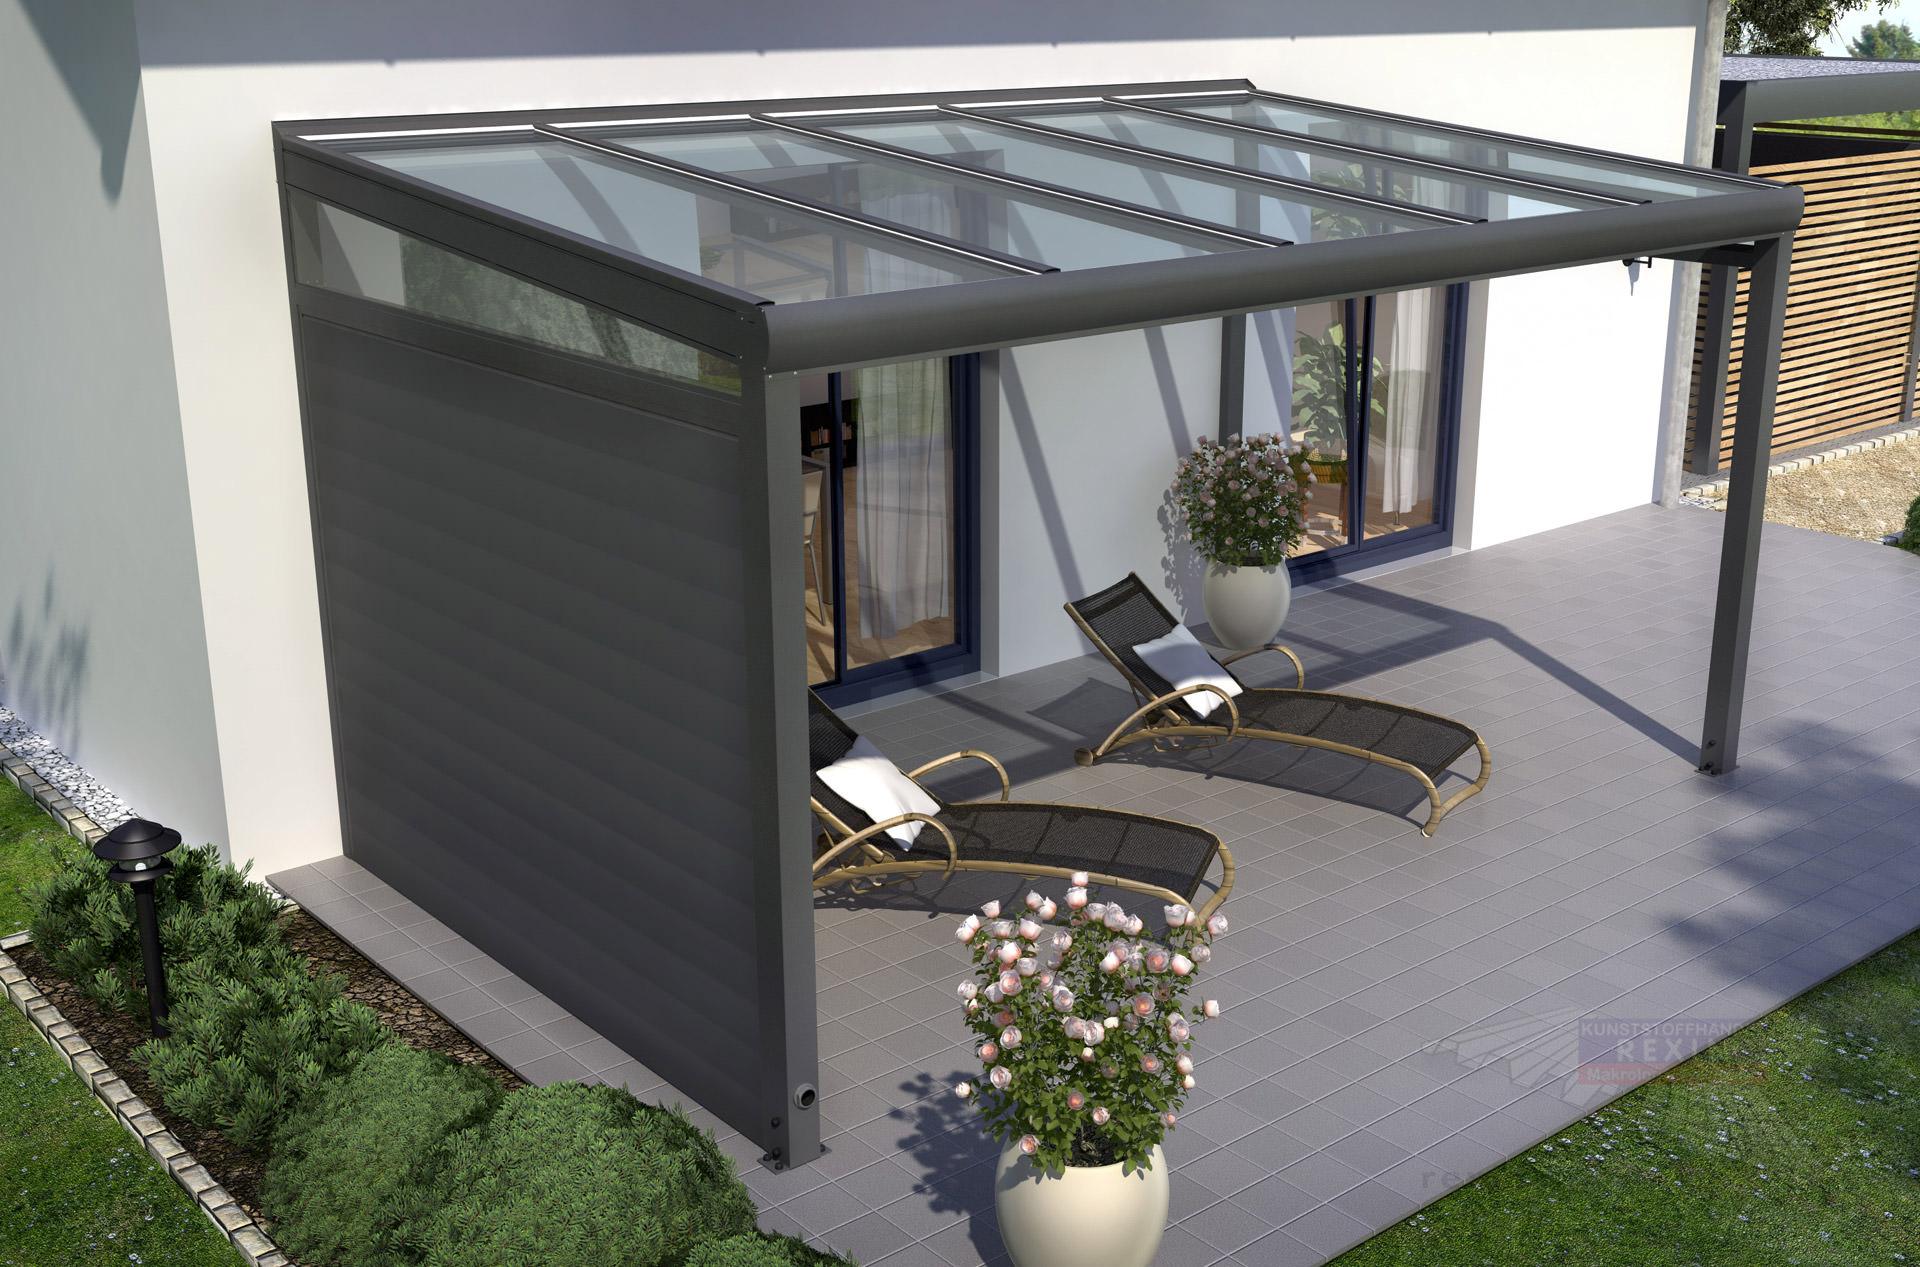 rexocover terrassen seitenwand 2 10m h he rexocover terrassen seitenwand 2 10m h he rexin shop. Black Bedroom Furniture Sets. Home Design Ideas